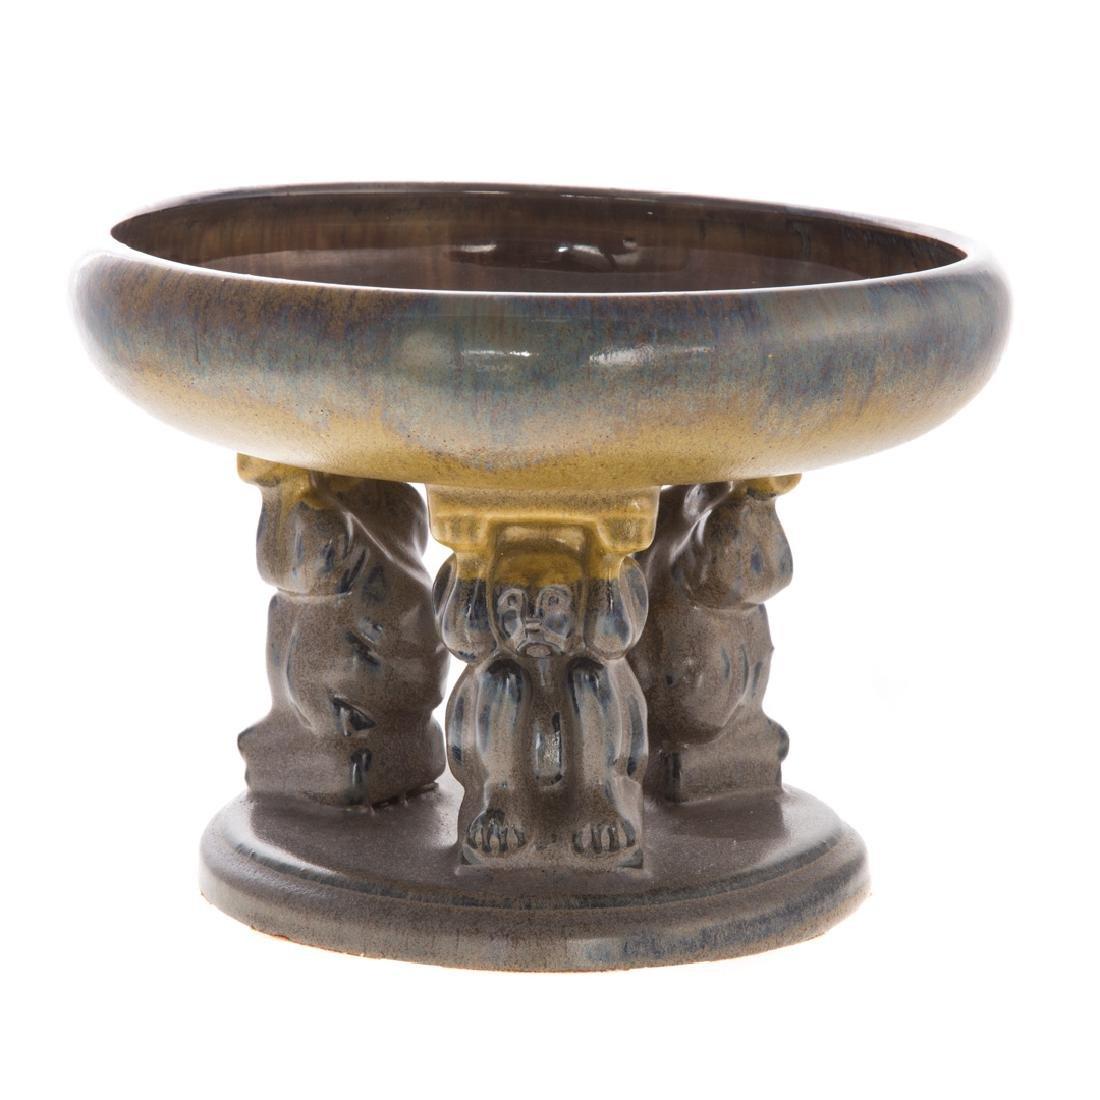 Fulper art pottery Effigy bowl